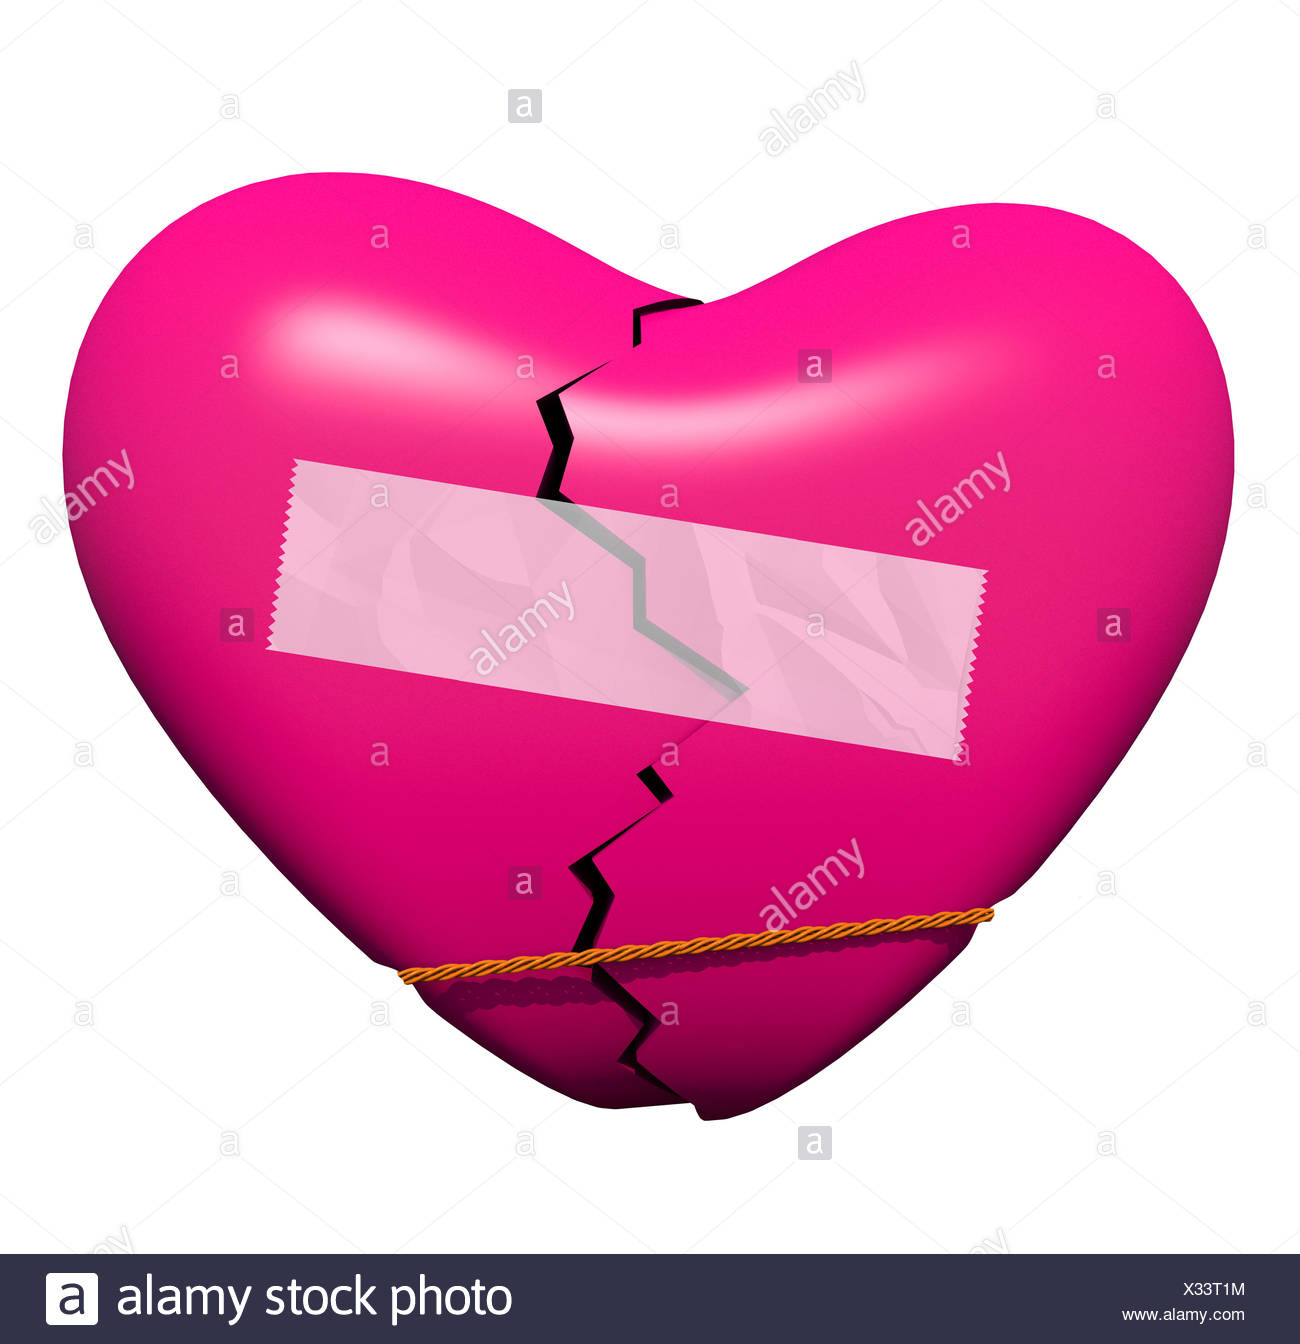 Mending a Broken Heart - Stock Image